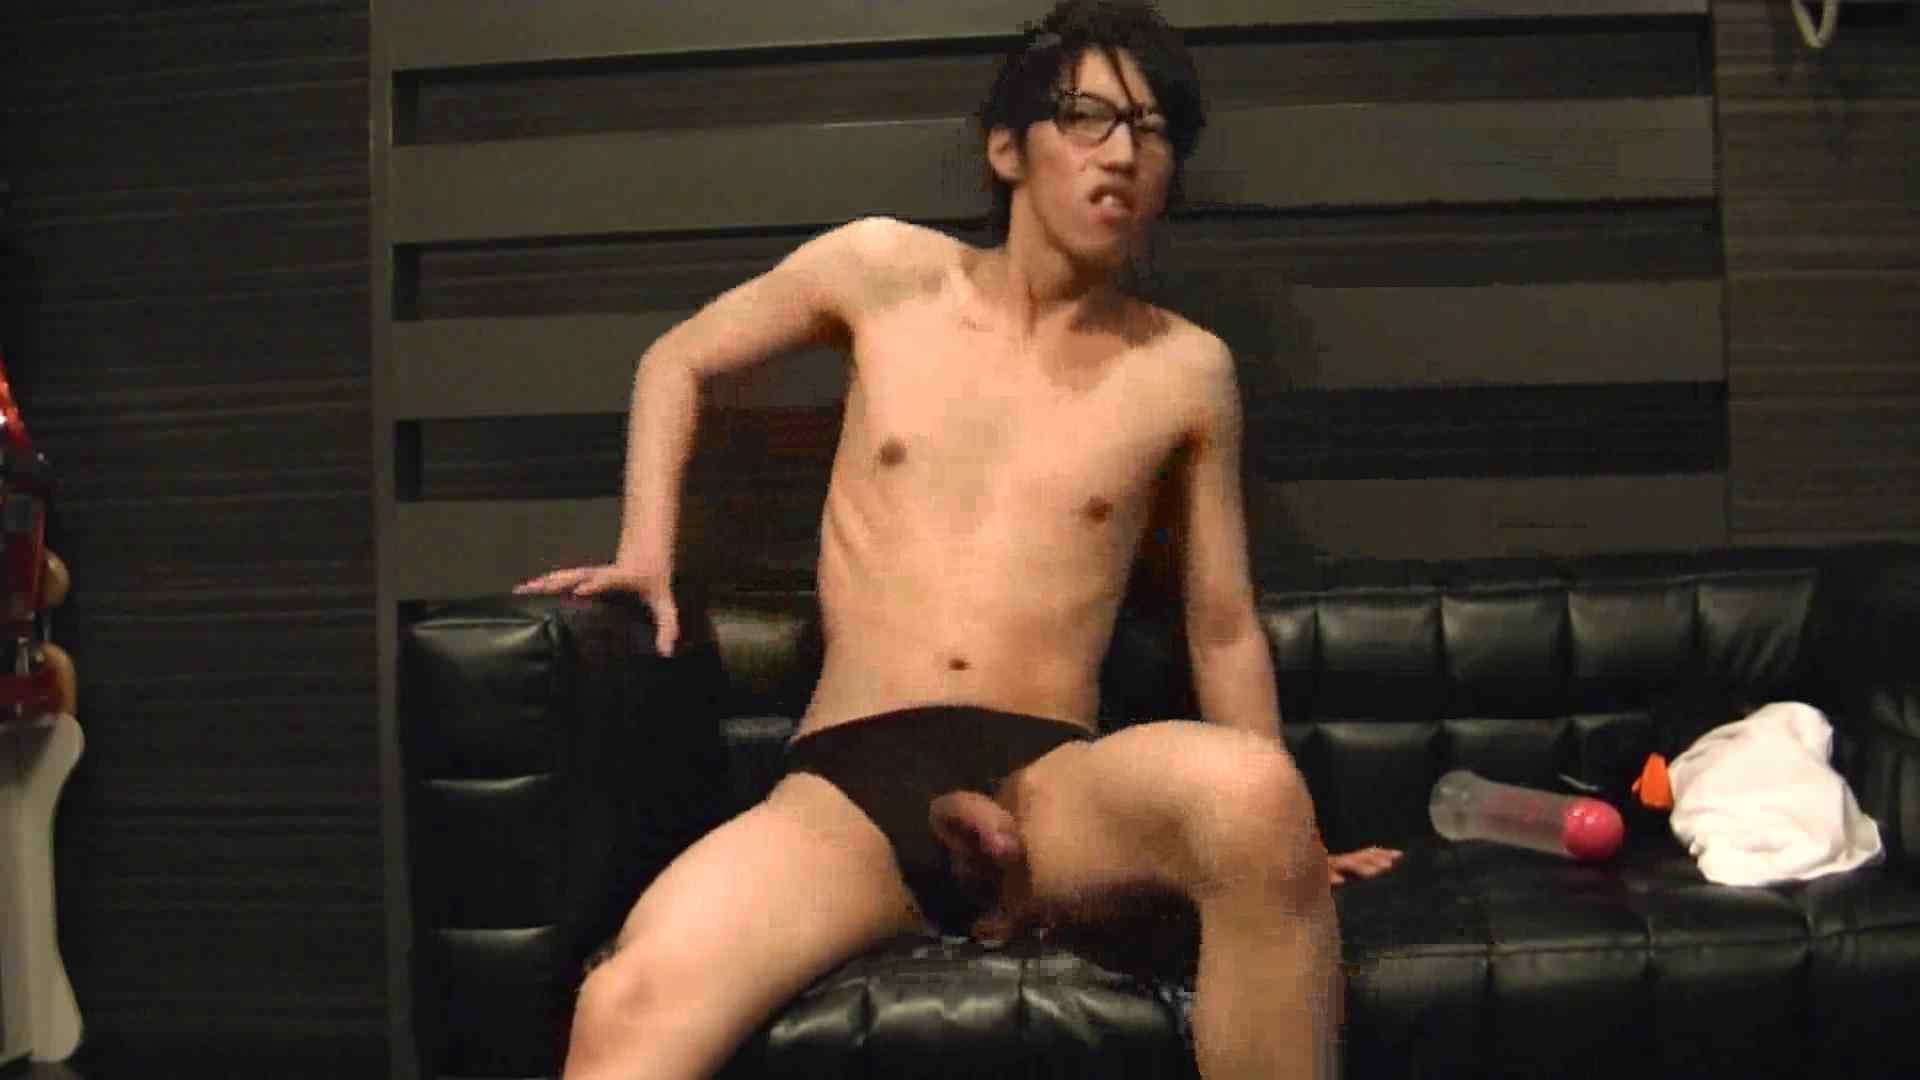 ONA見せカーニバル!! Vol3 モザ無し ゲイ無修正画像 87枚 24